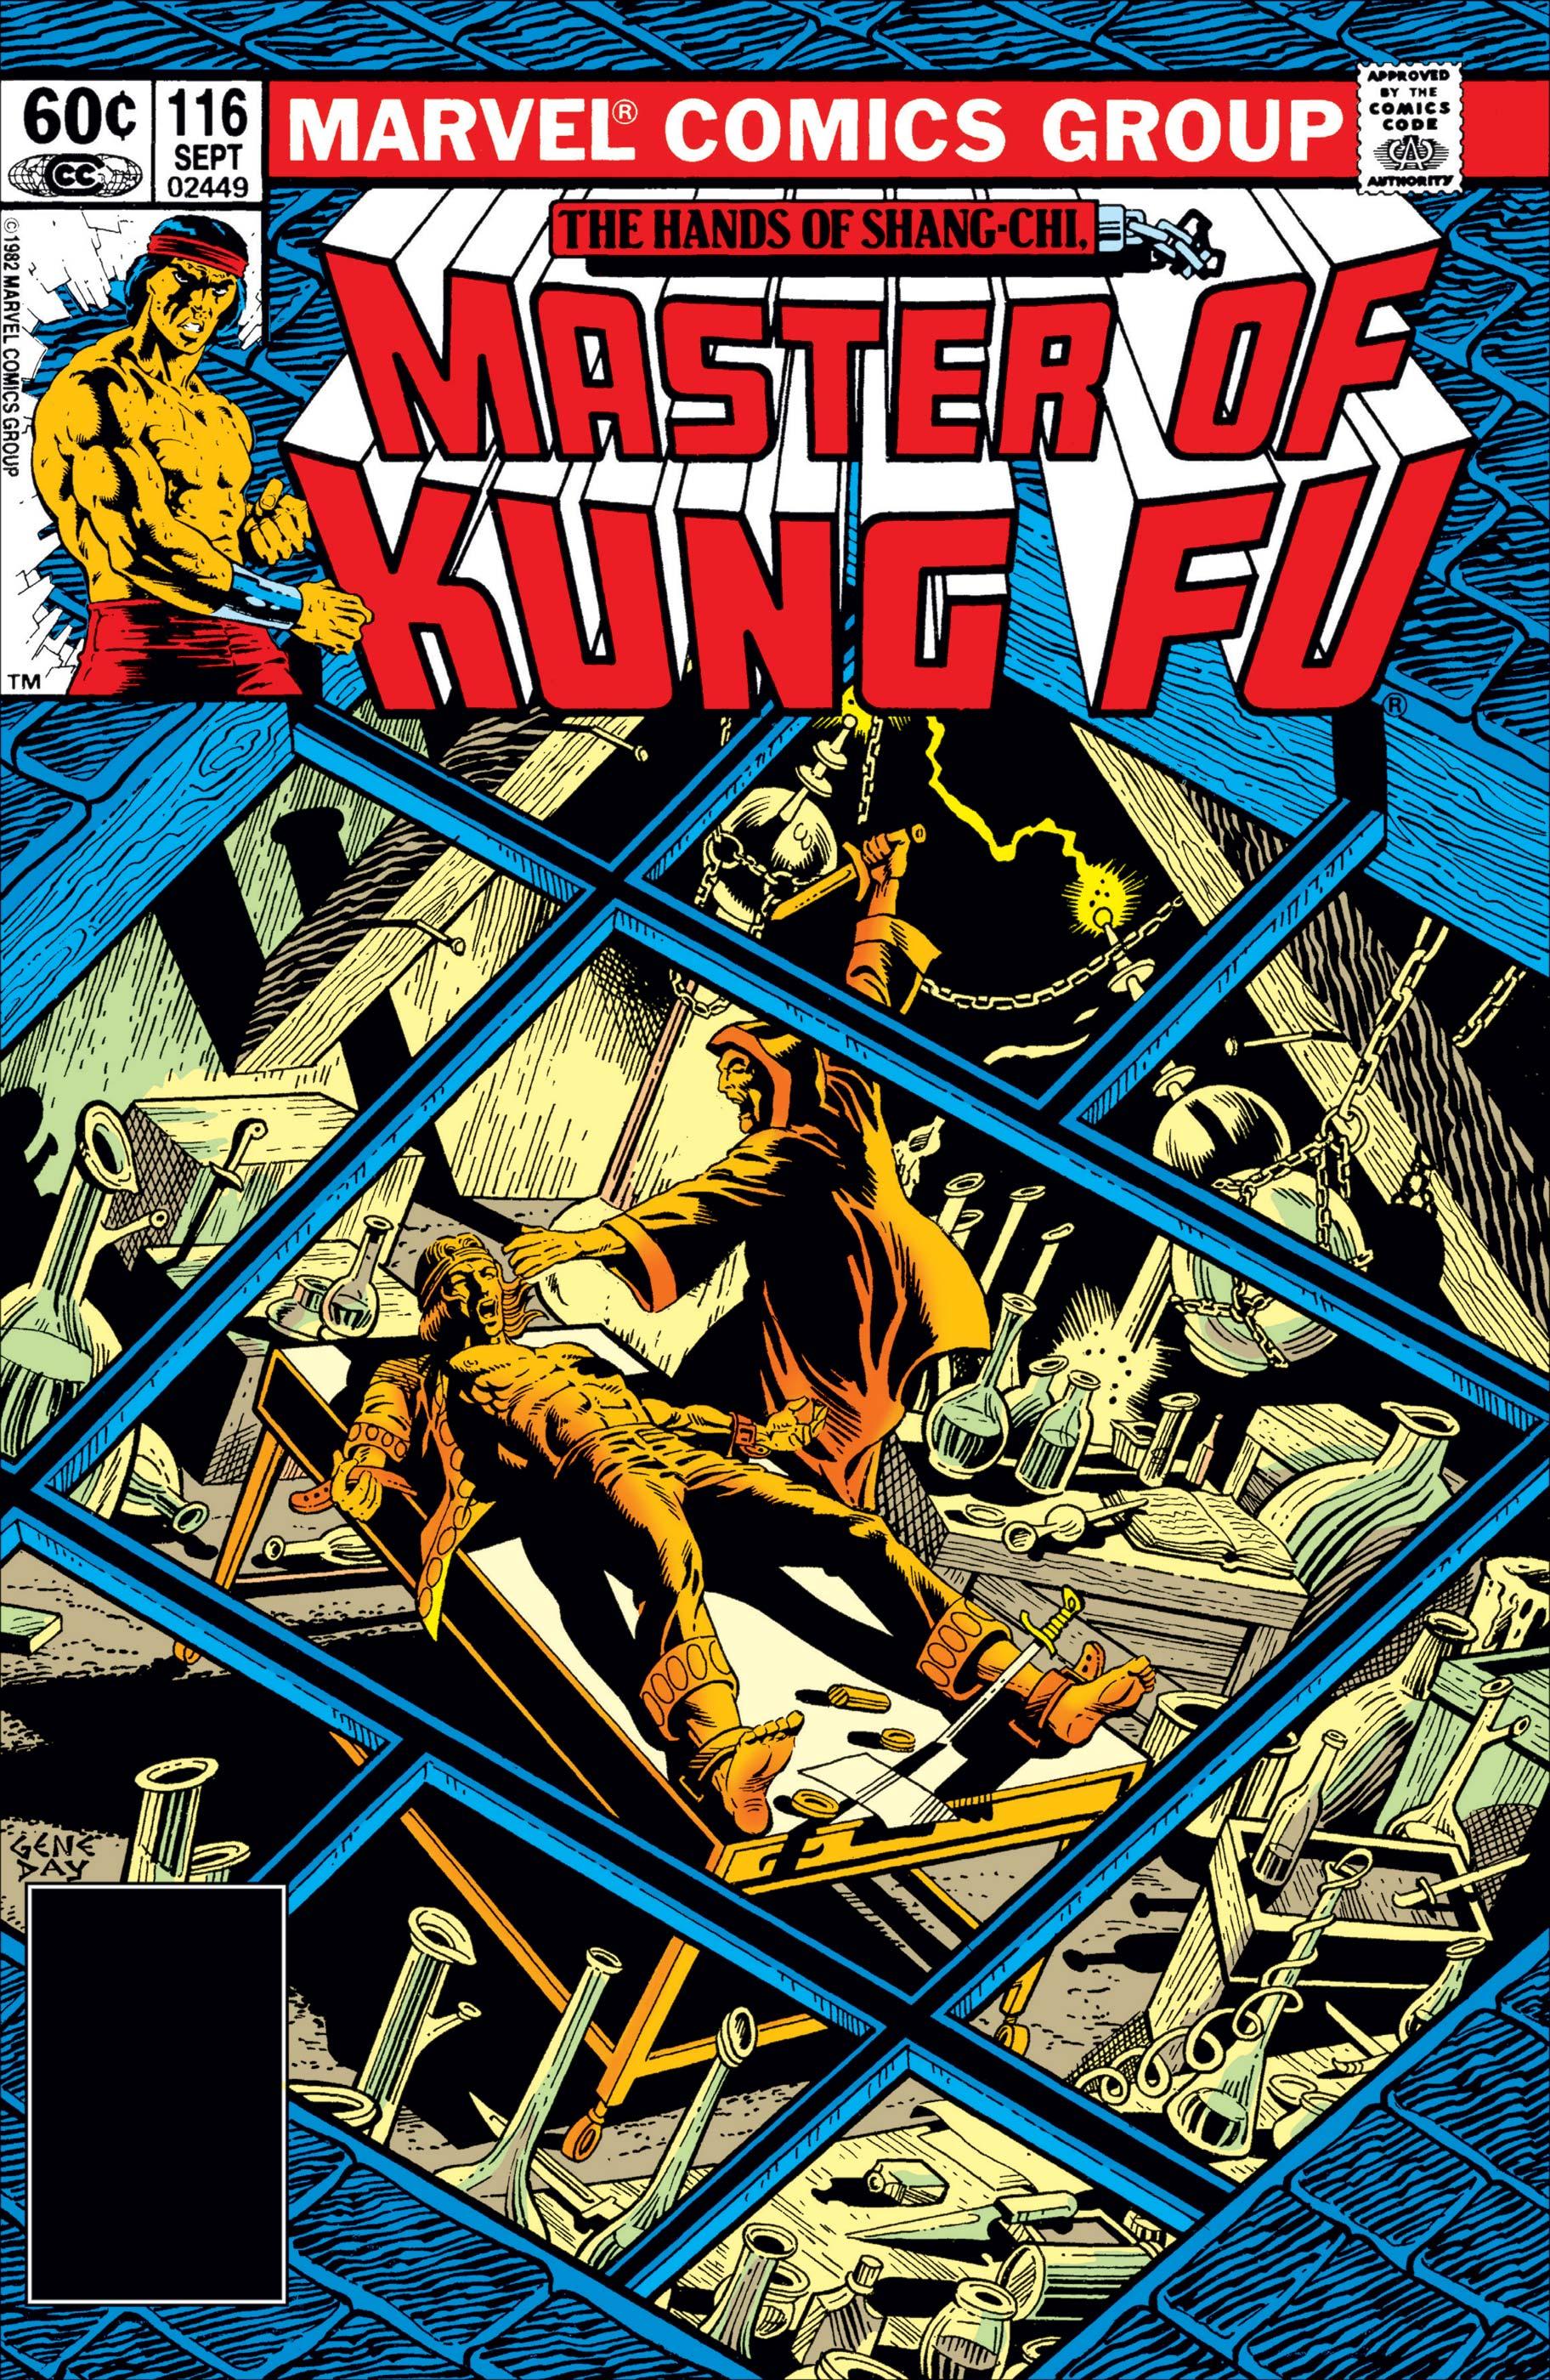 Master of Kung Fu (1974) #116